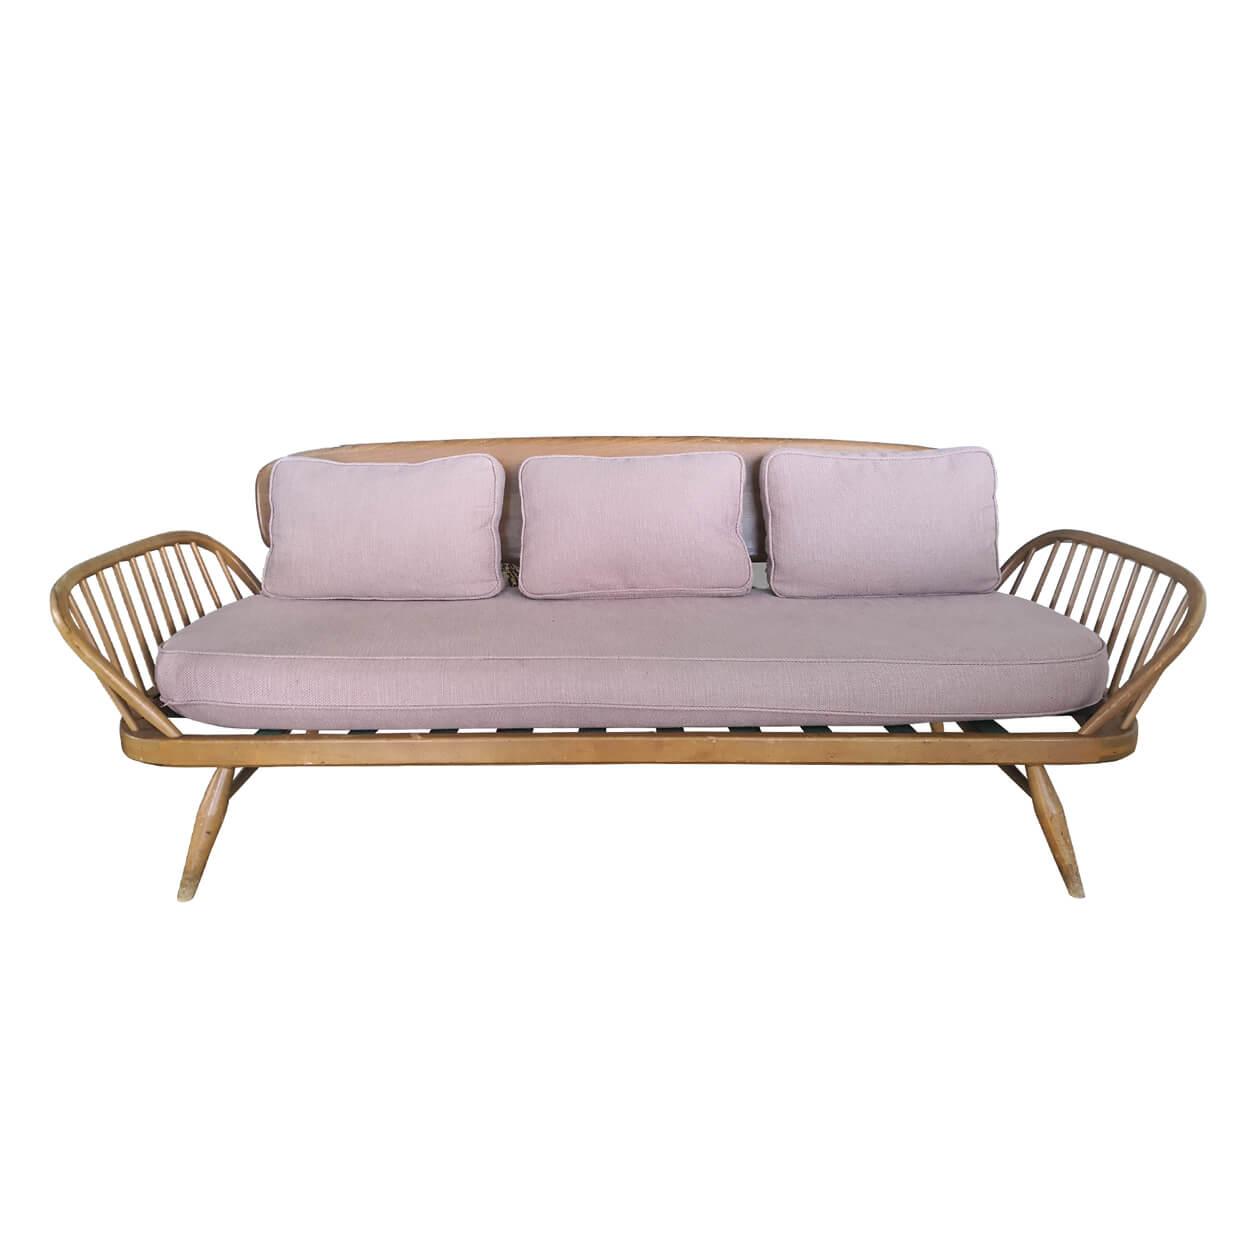 Two Design Lovers Original Ercol Studio Sofa front